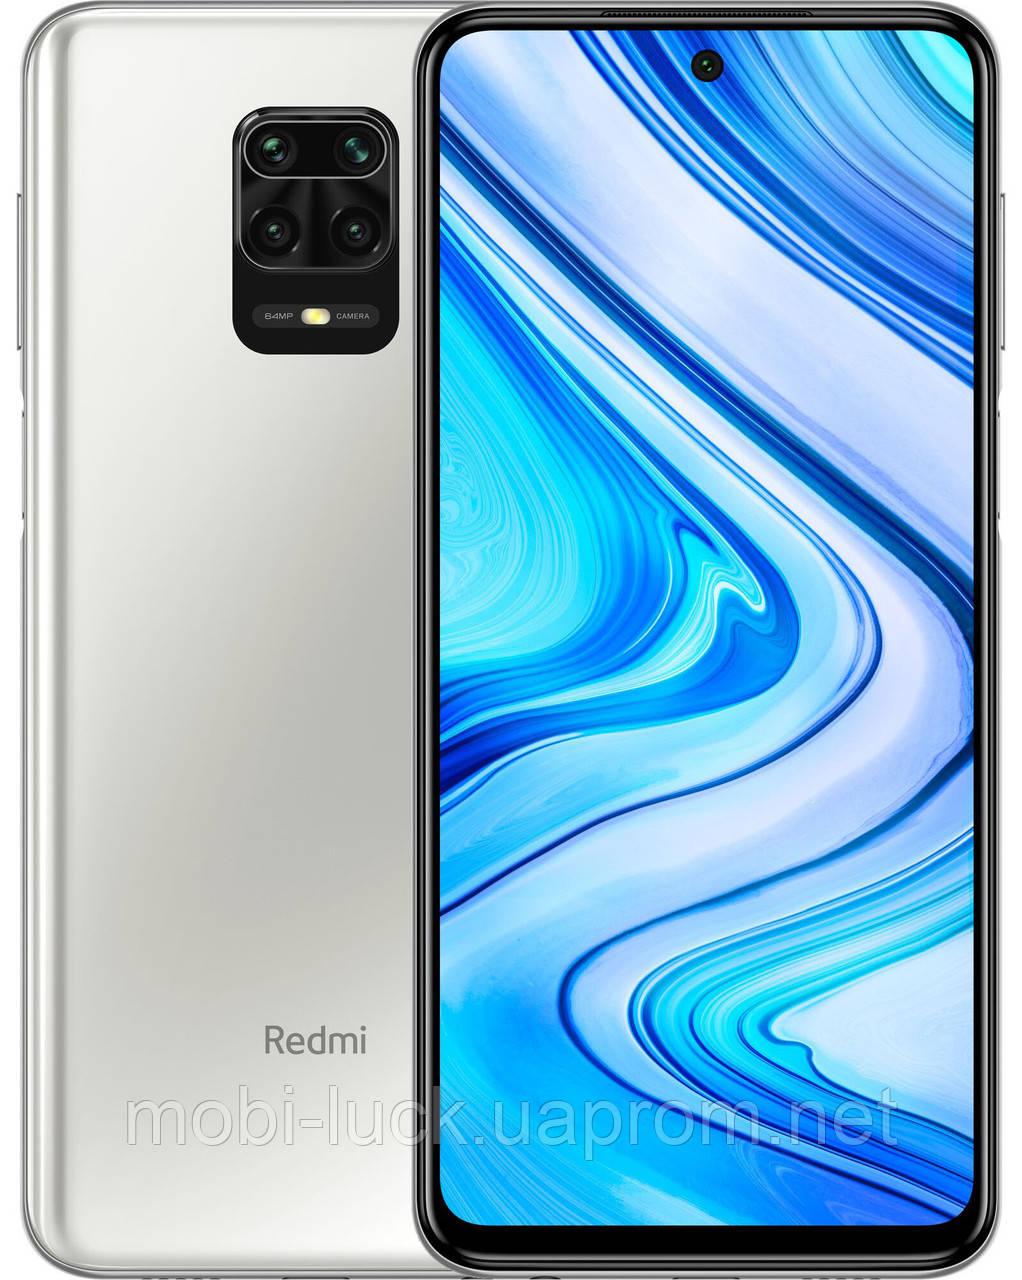 Смартфон Xiaomi Redmi Note 9 Pro 6/64GB Polar White (Global)